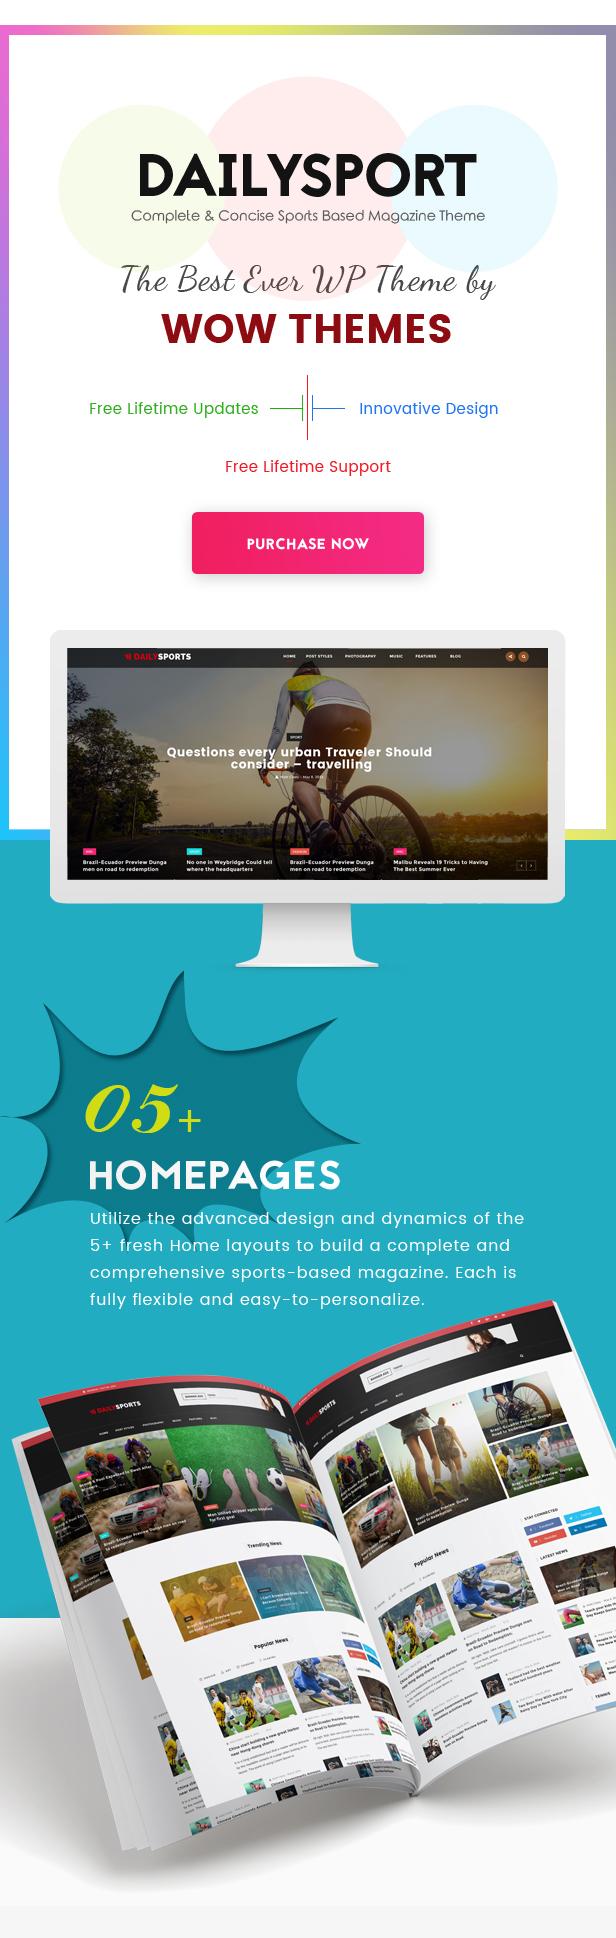 DailySports - Blog Sports and Magazine Responsive WordPress Theme